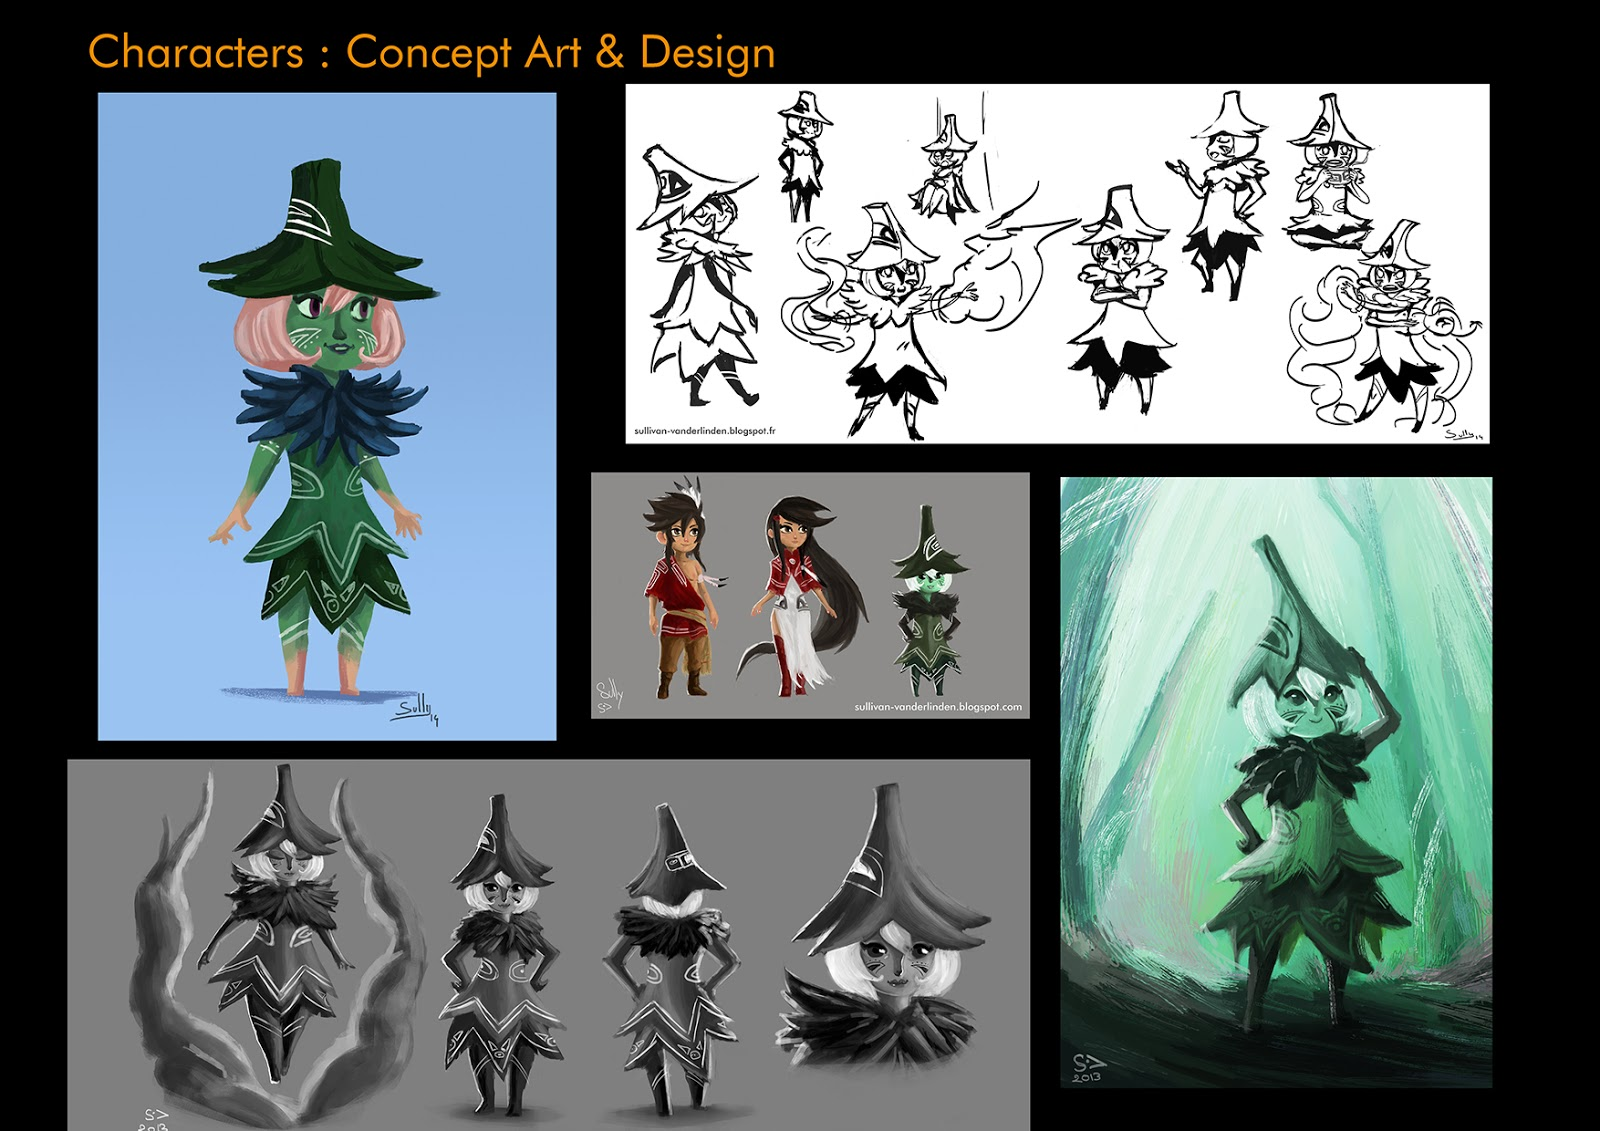 Sullivan vanderlinden portfolio character design